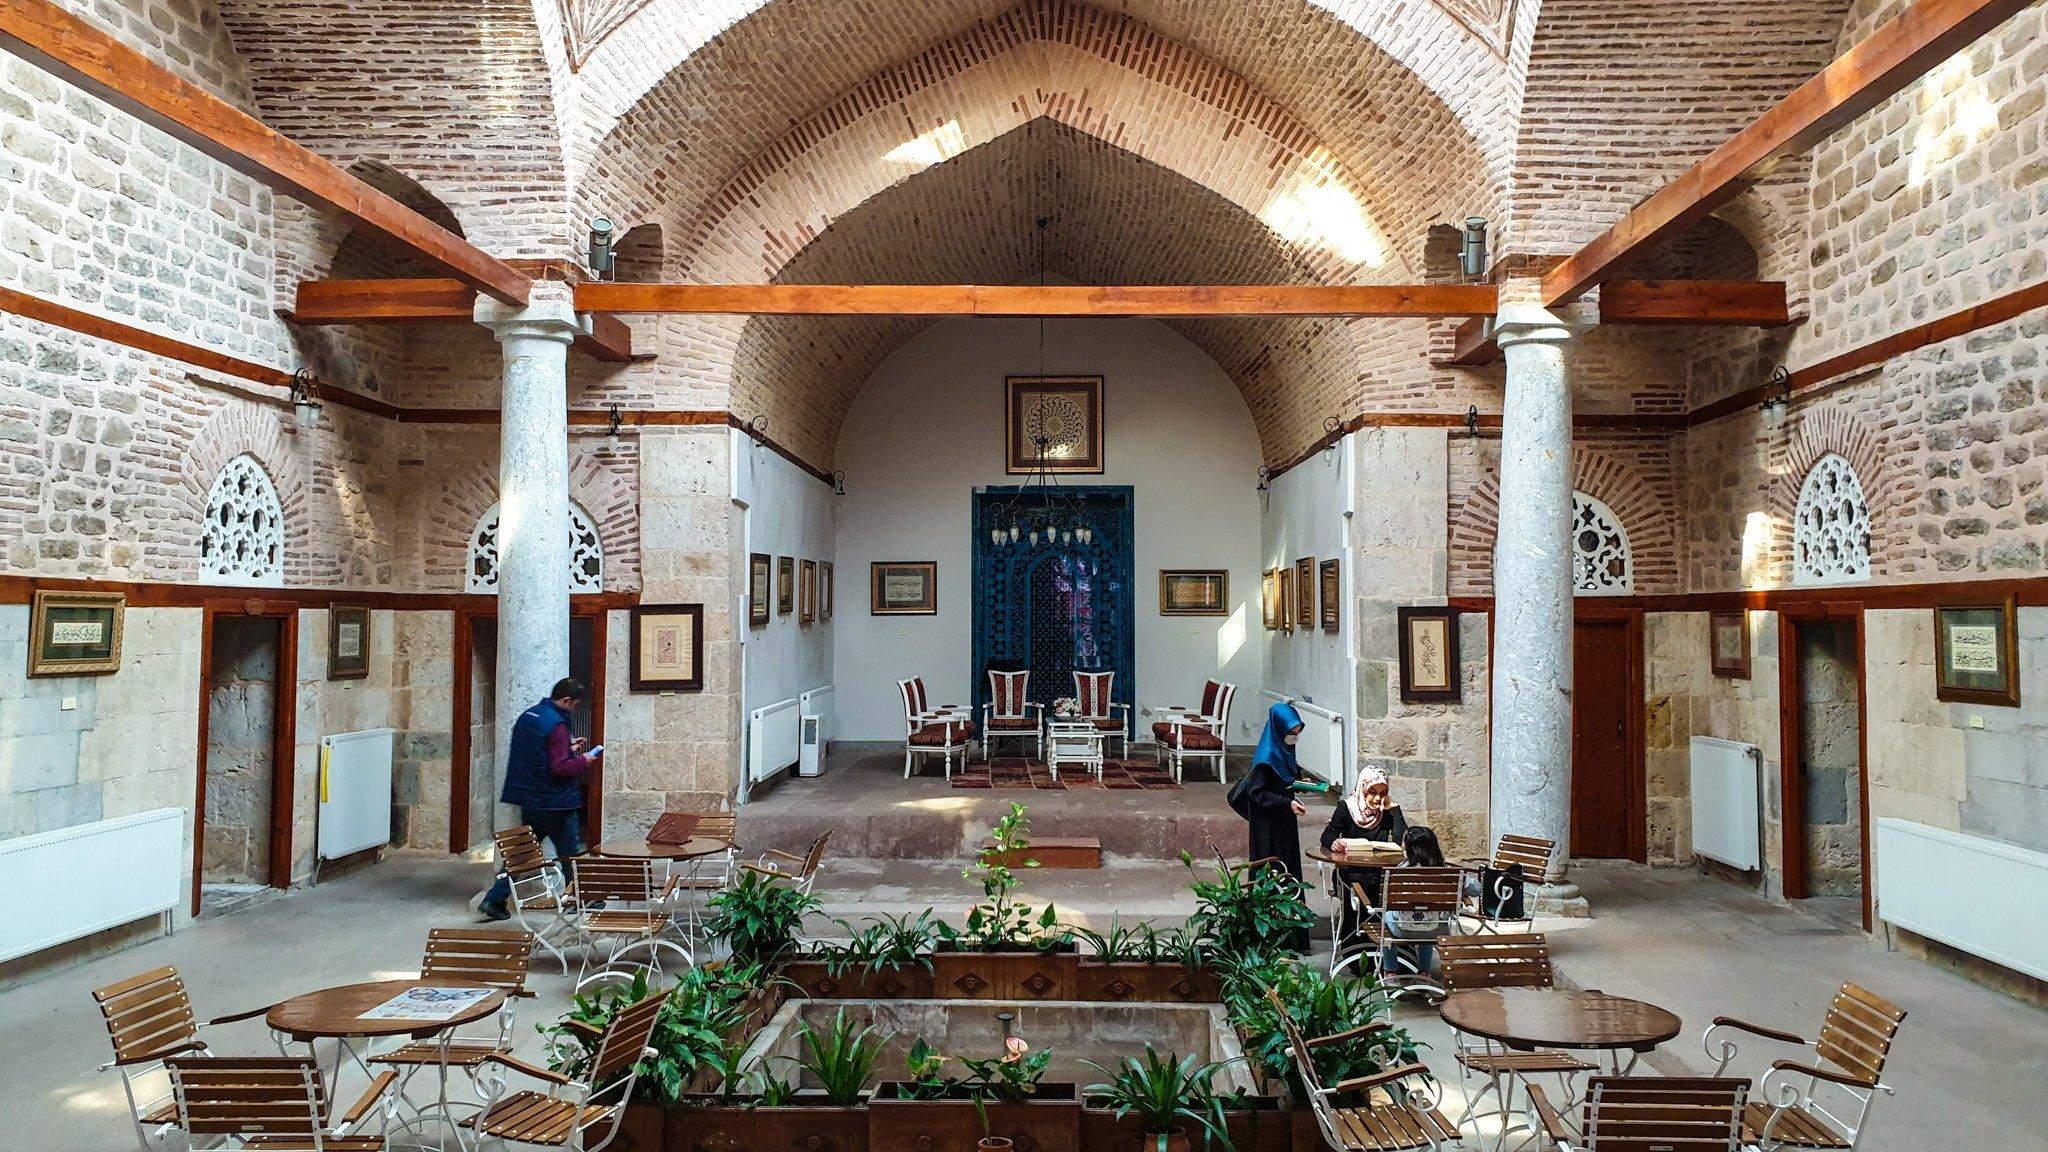 The hall of Mahmudiye Madrassa. (Photo by Argun Konuk)